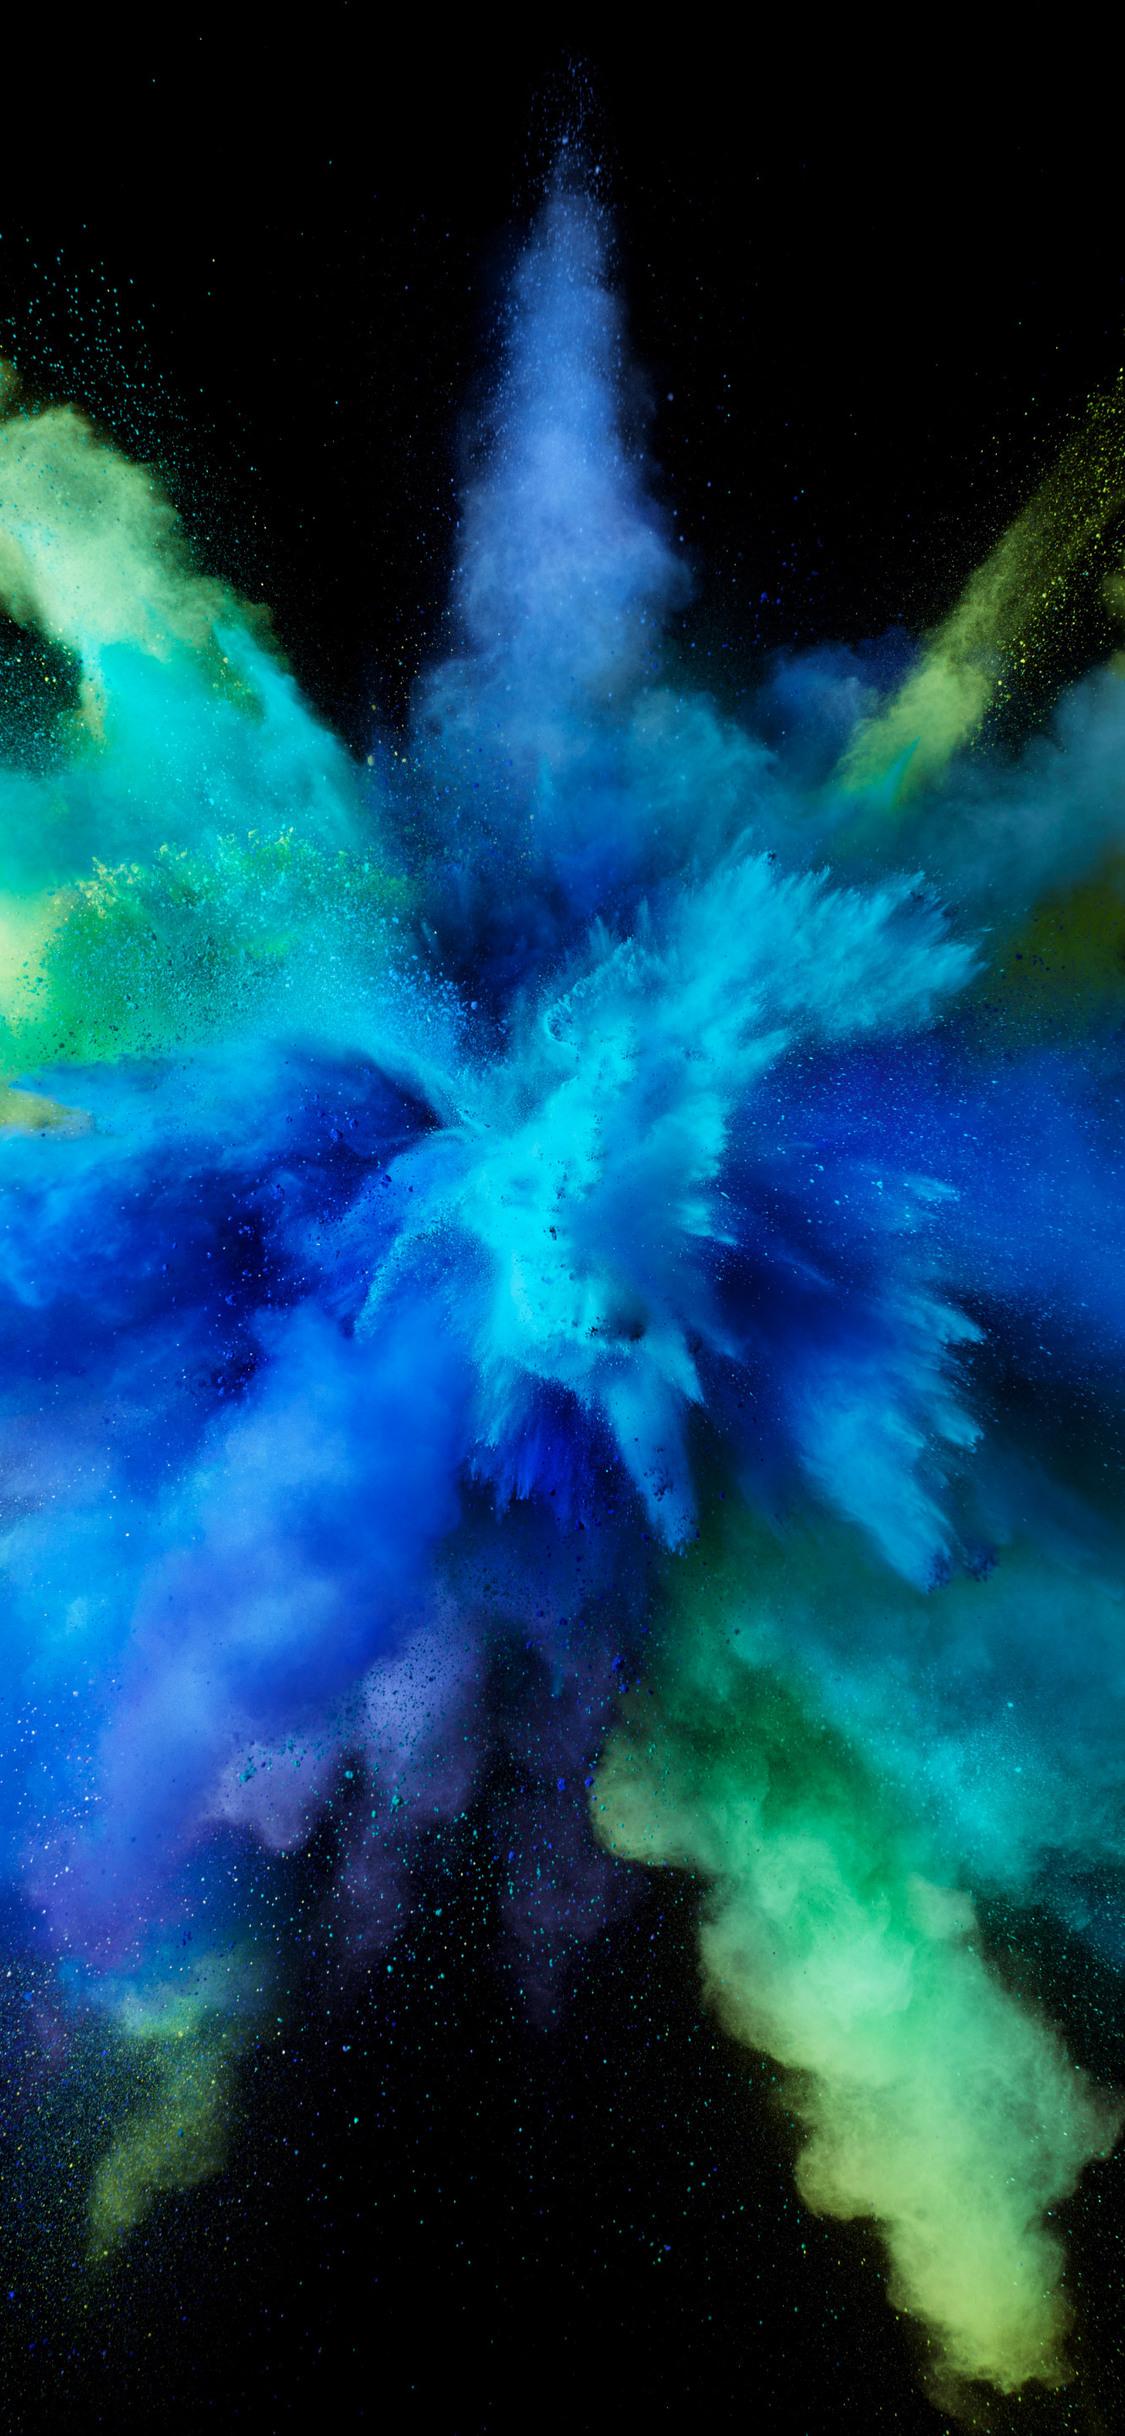 1125x2436 Mac OS Sierra Color Splash Blue 5k Iphone XS ...